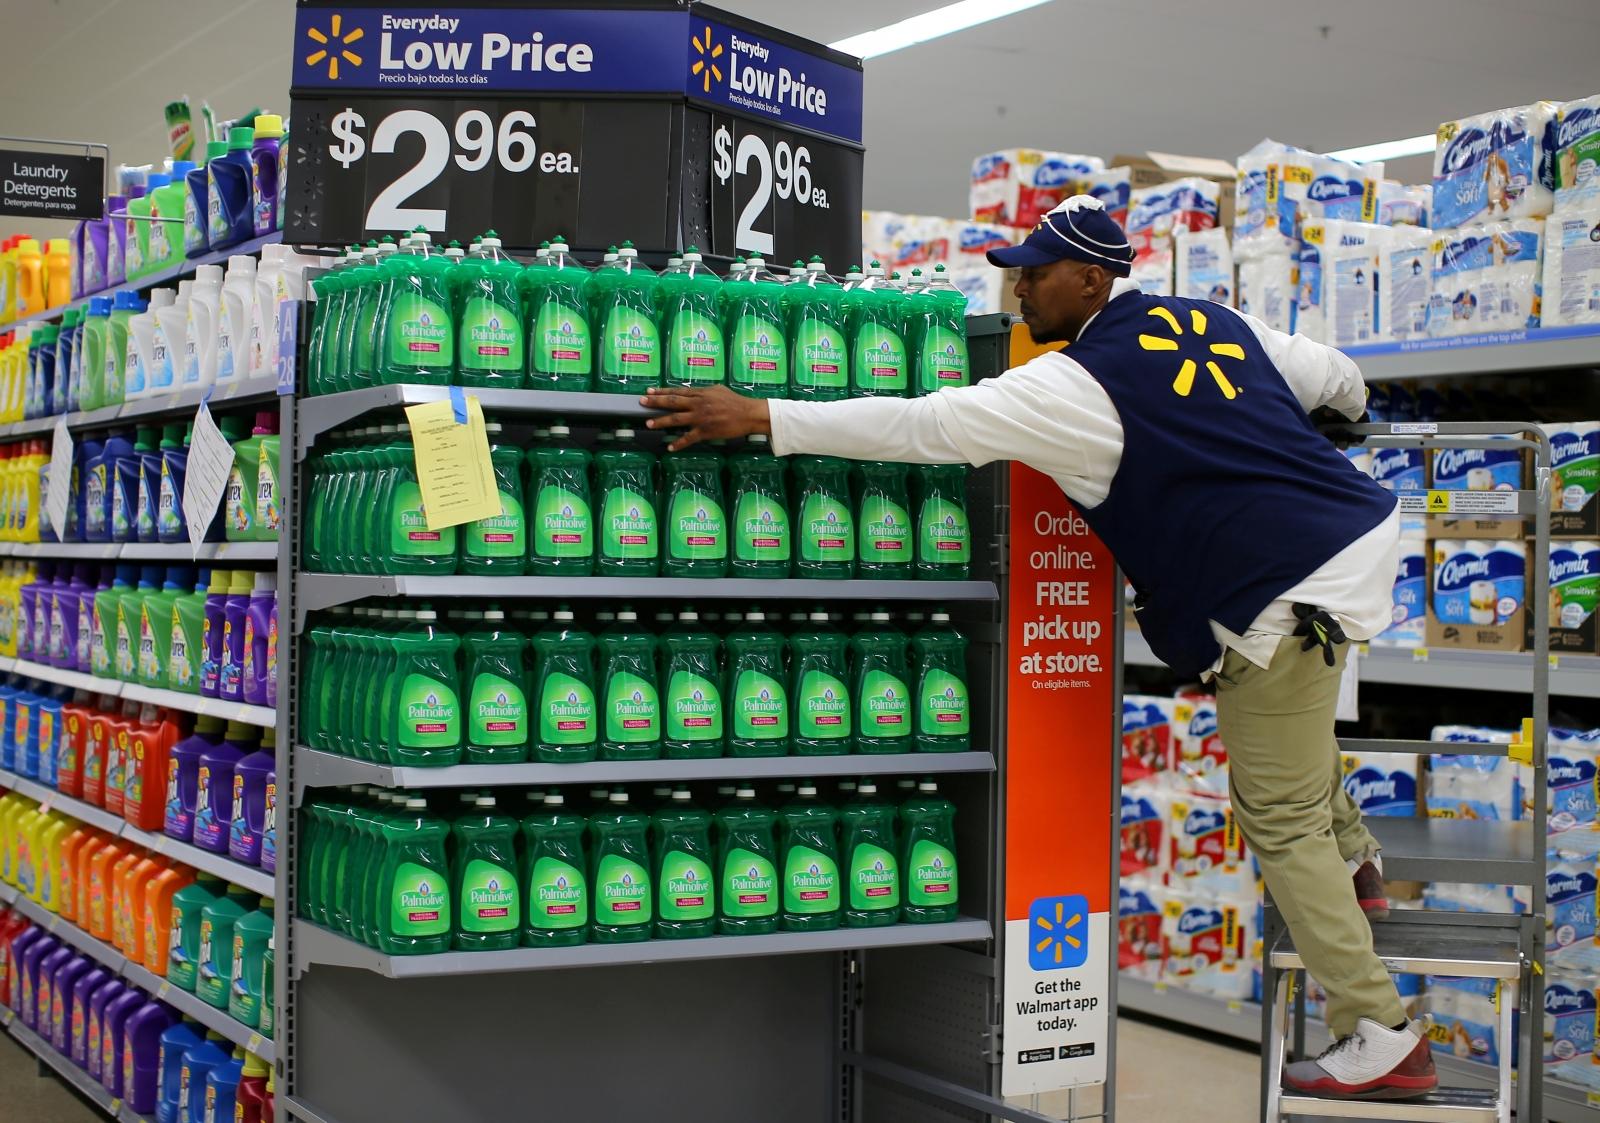 Shop assistant restocking shelves at Walmart